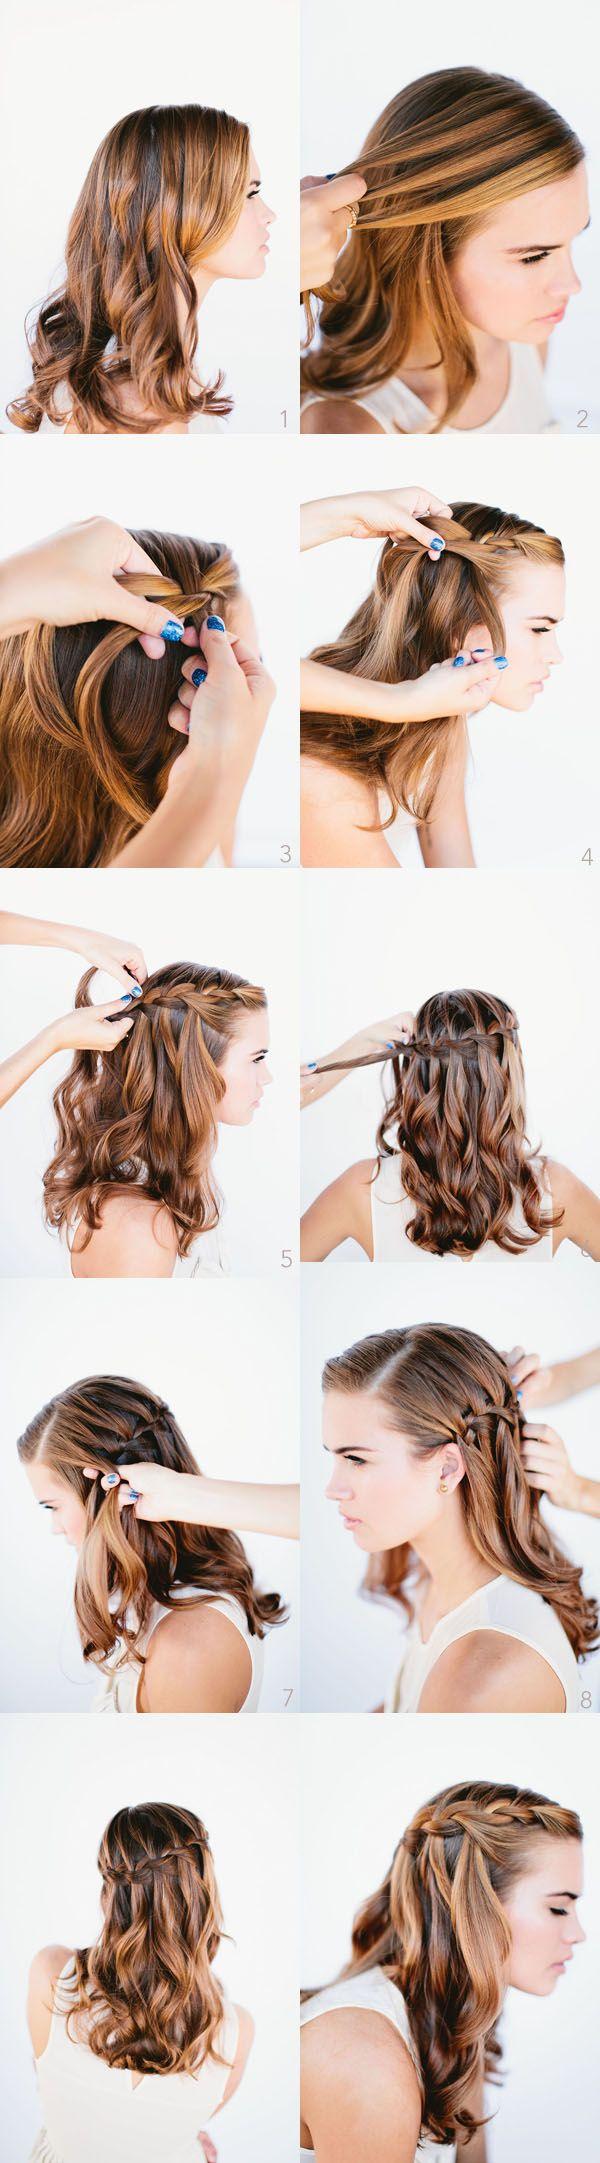 Pleasing 1000 Ideas About Junior Bridesmaid Hairstyles On Pinterest Short Hairstyles For Black Women Fulllsitofus